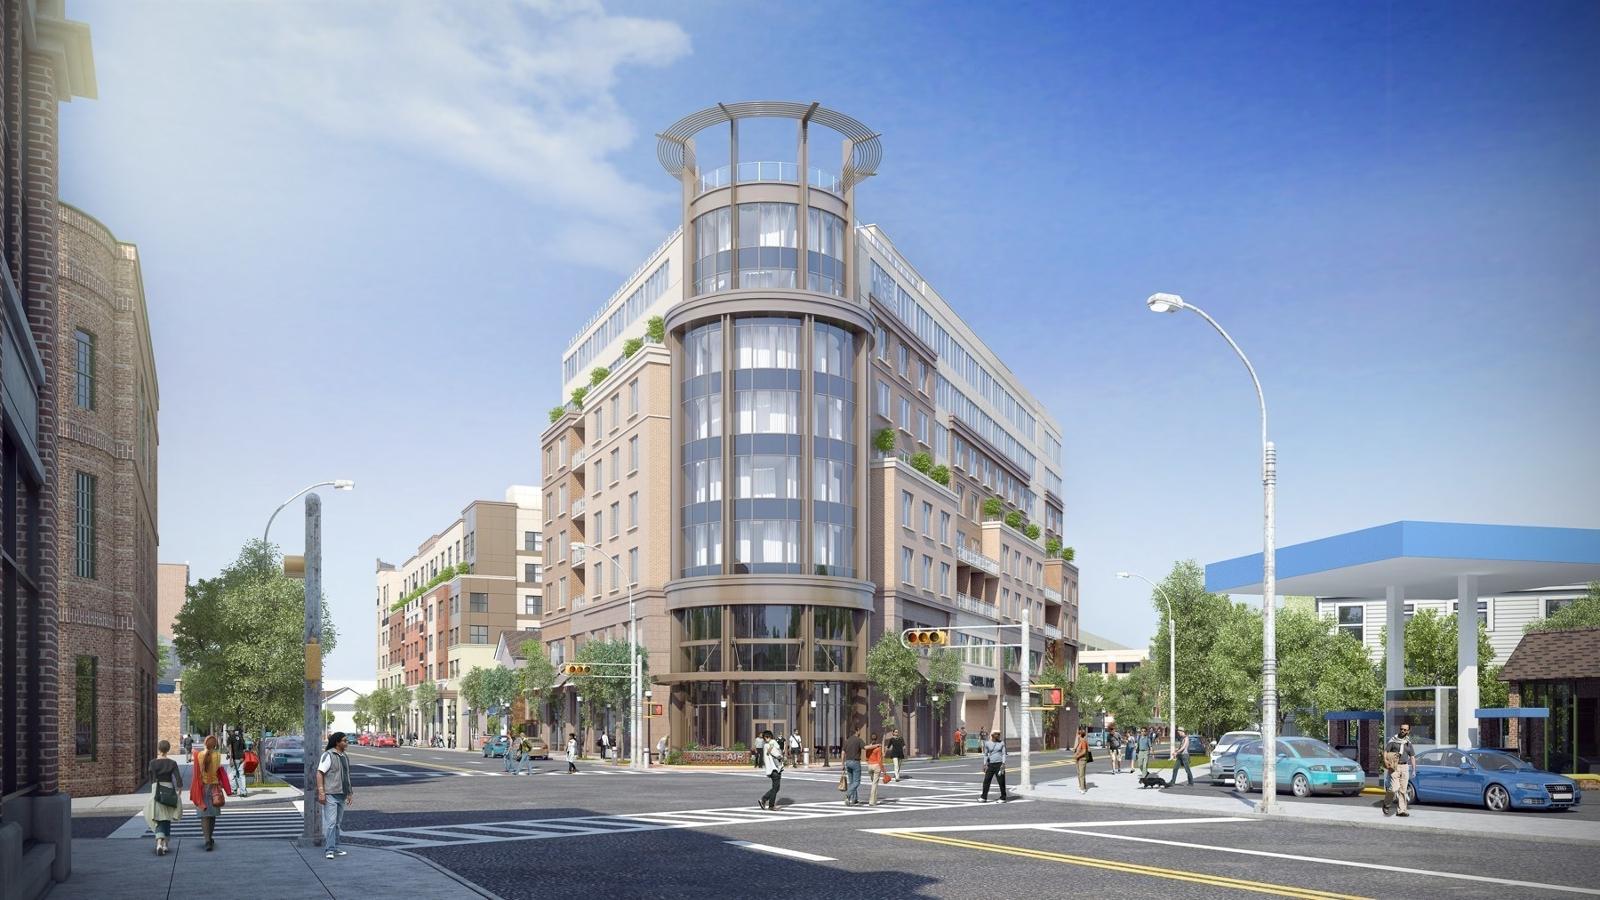 The Mc Luxury Boutique Hotel Breaks Ground In Montclair Nj